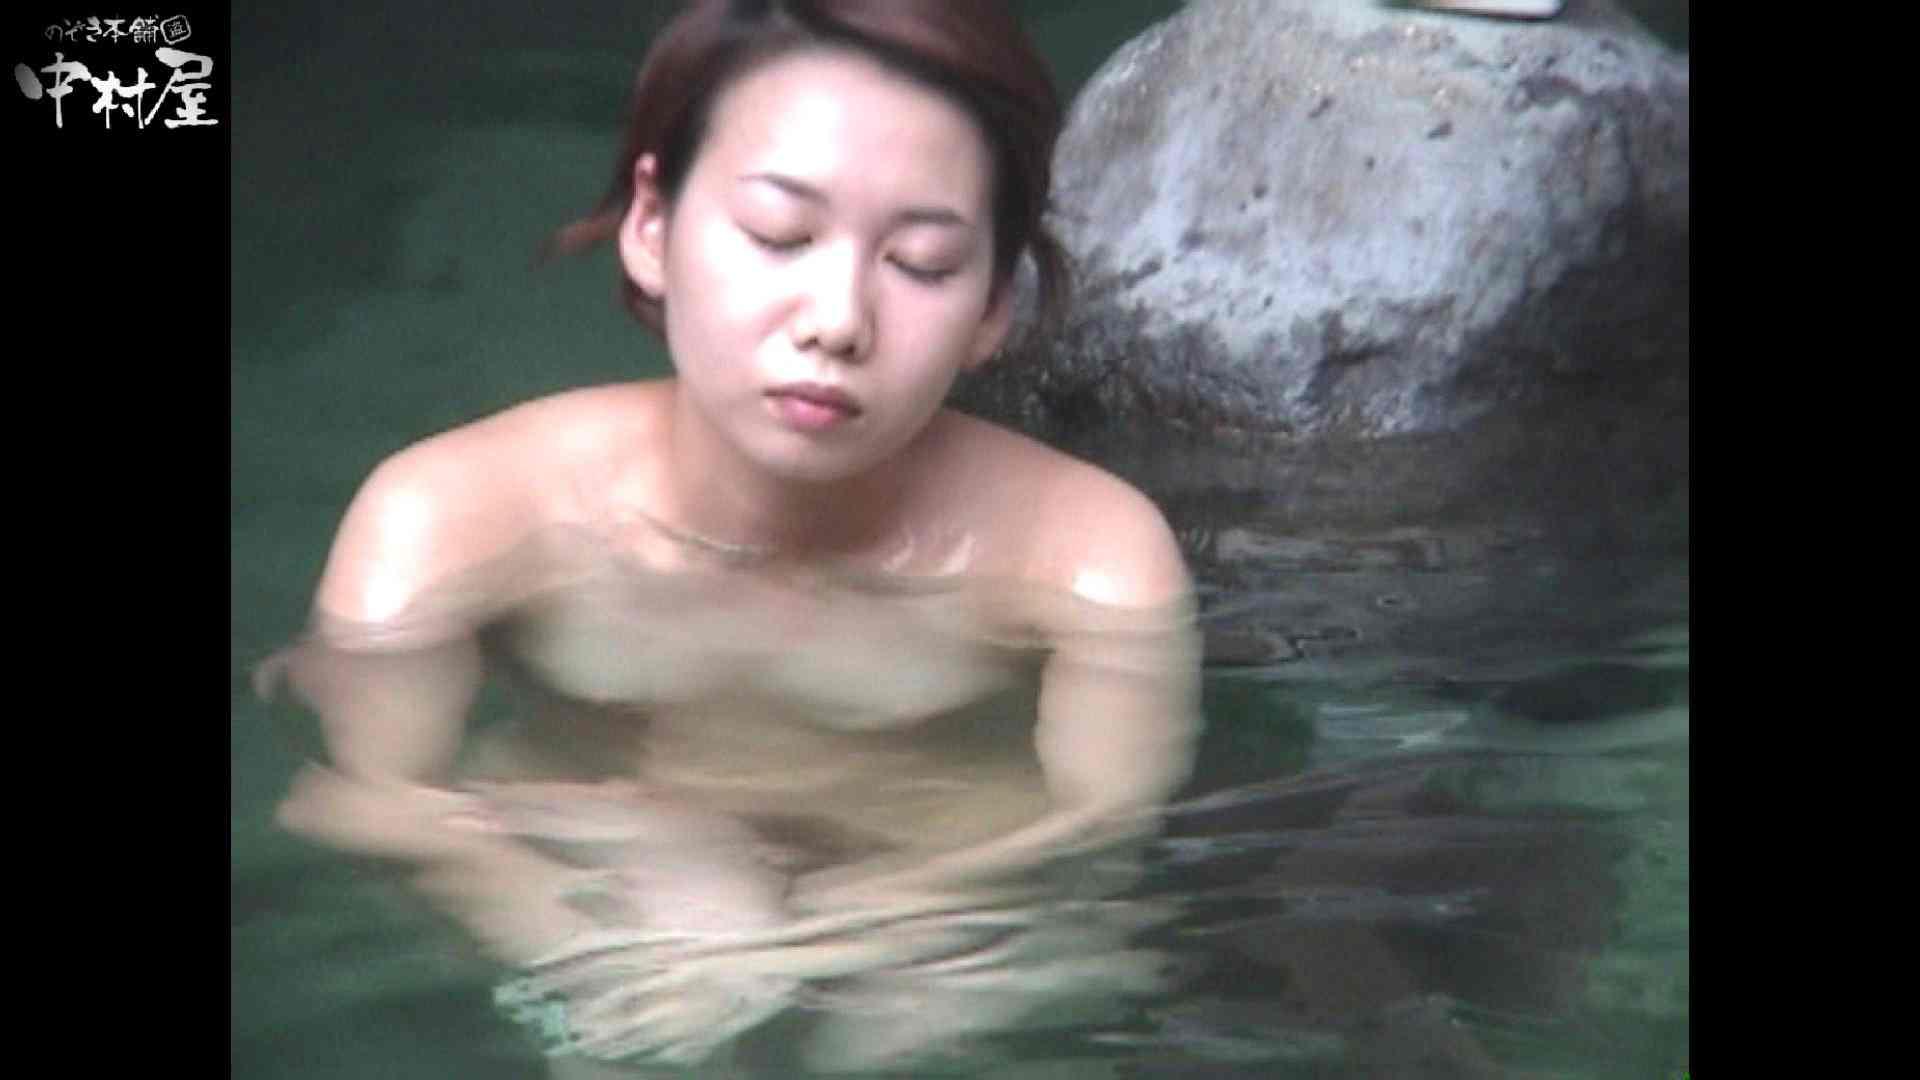 Aquaな露天風呂Vol.951 盗撮映像  93Pix 48